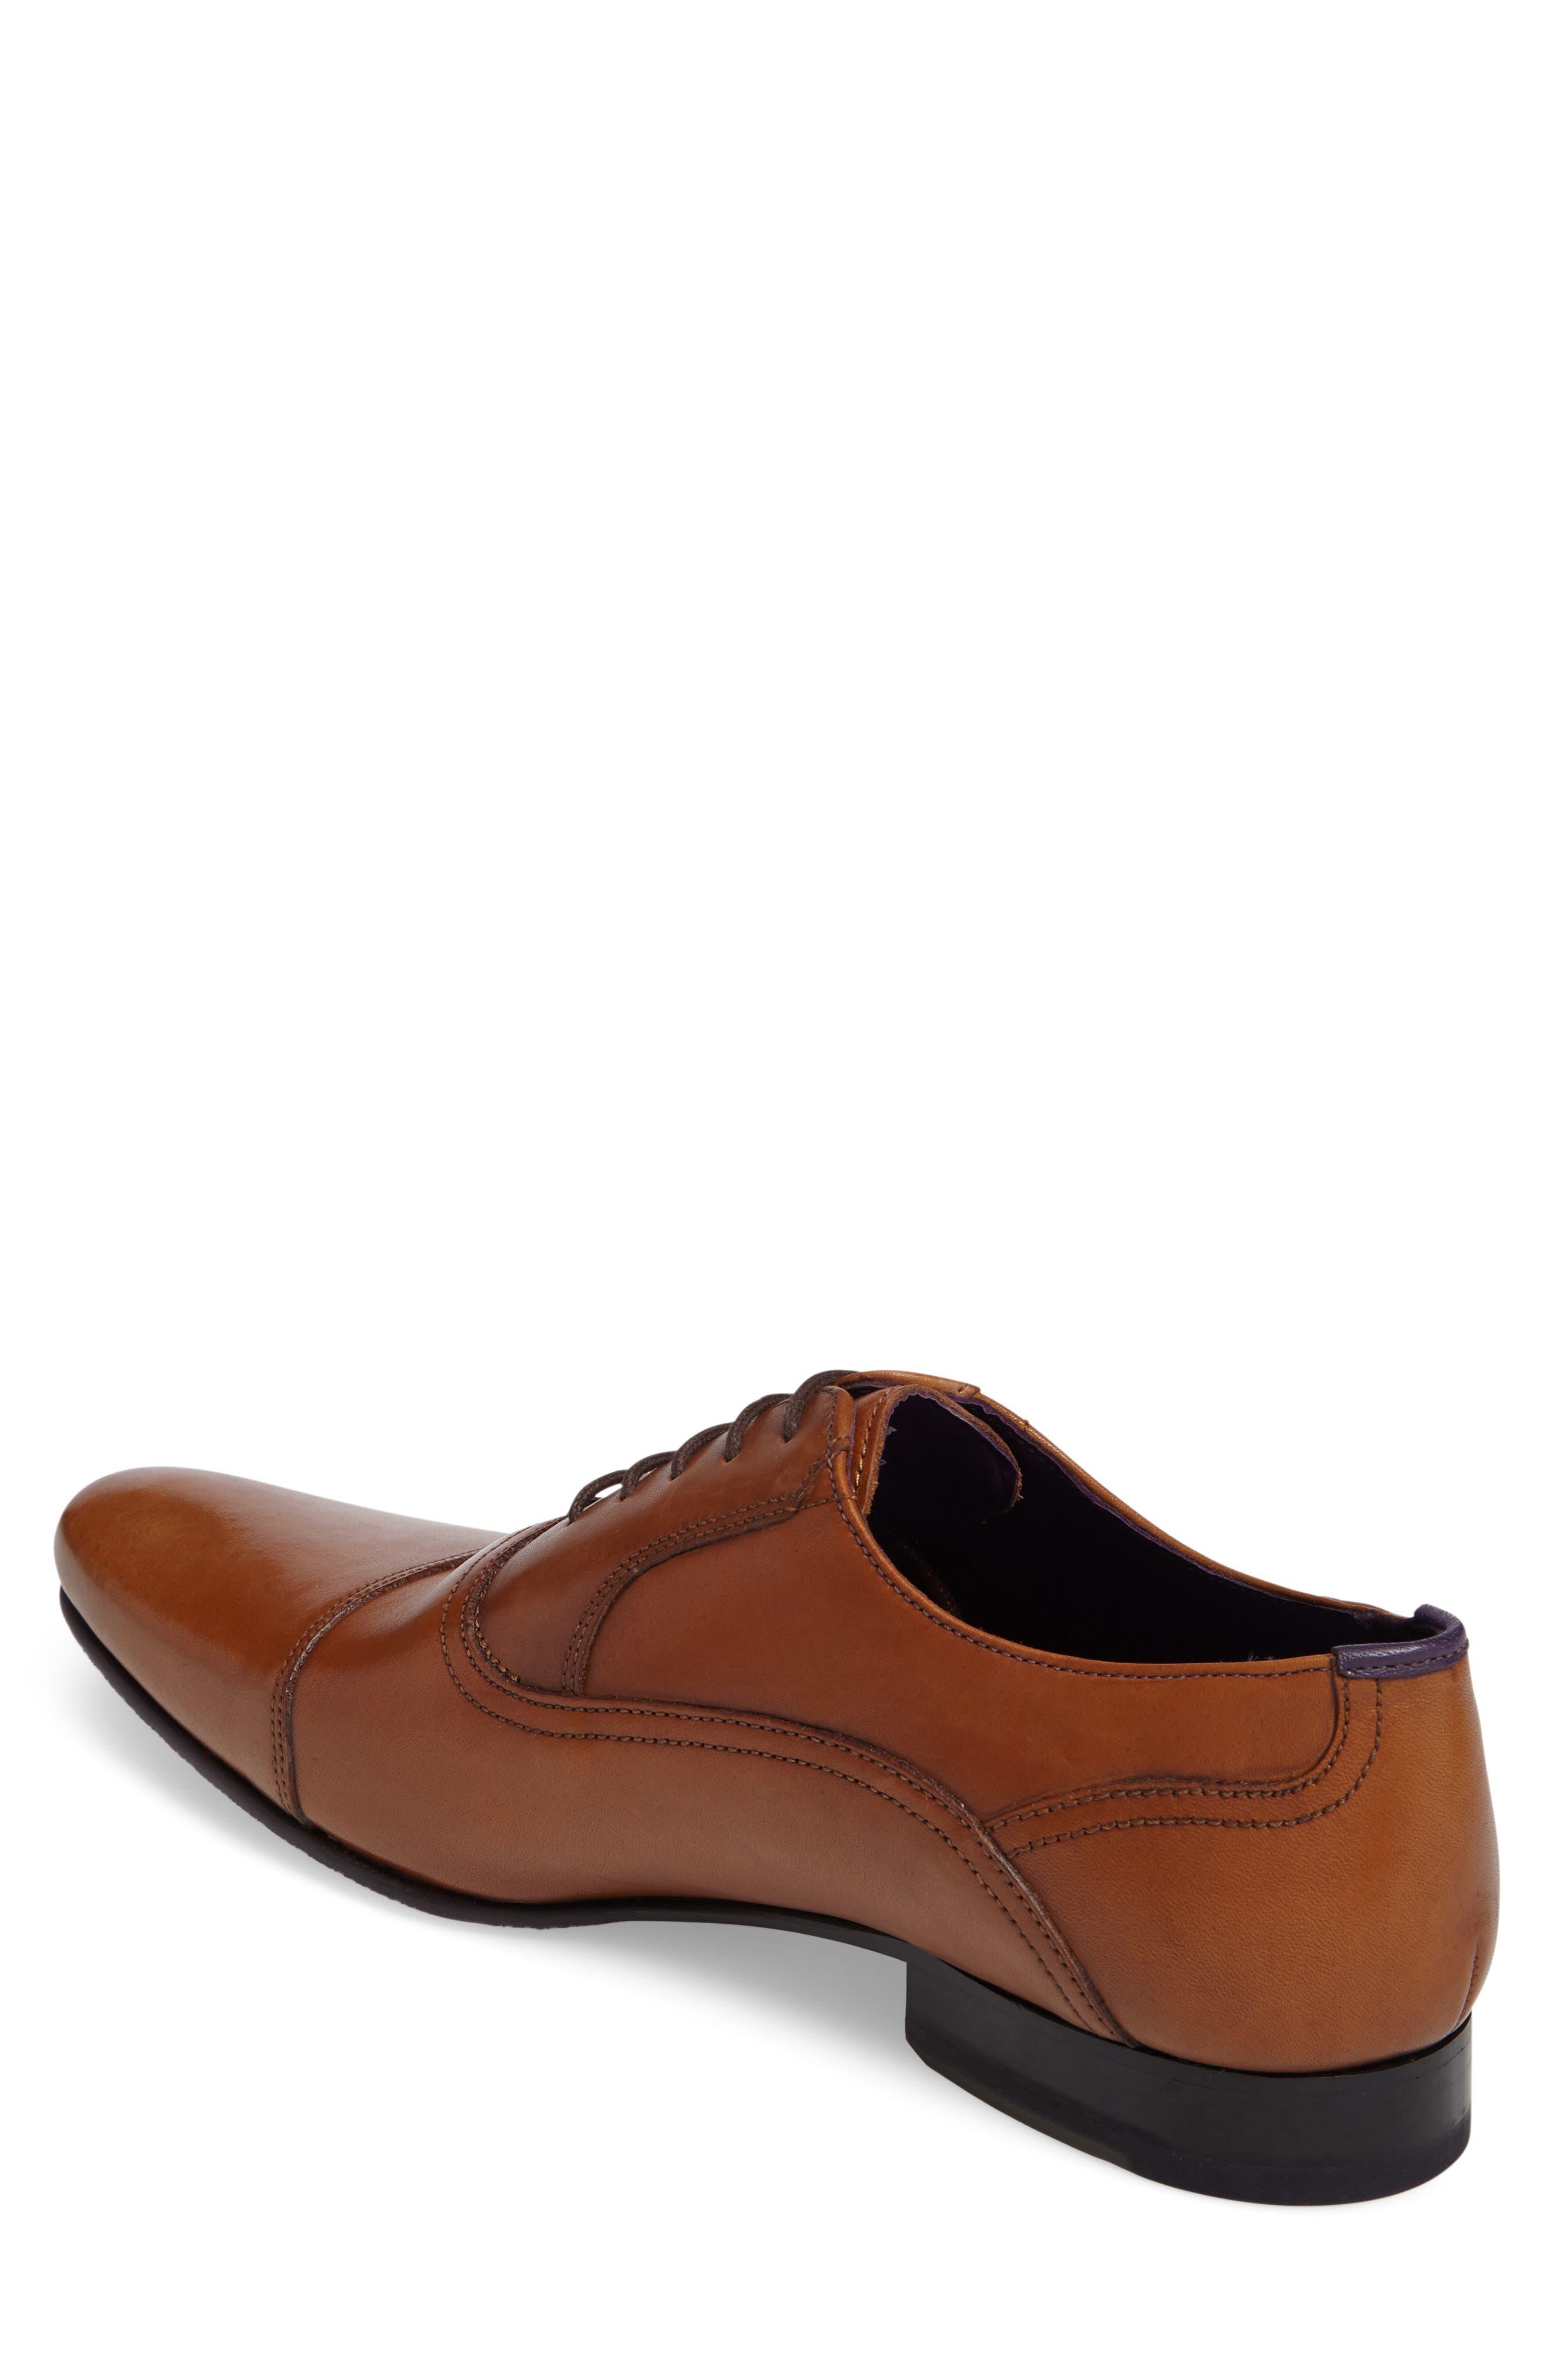 Rogrr 3 Cap Toe Oxford,                             Alternate thumbnail 2, color,                             Tan Leather